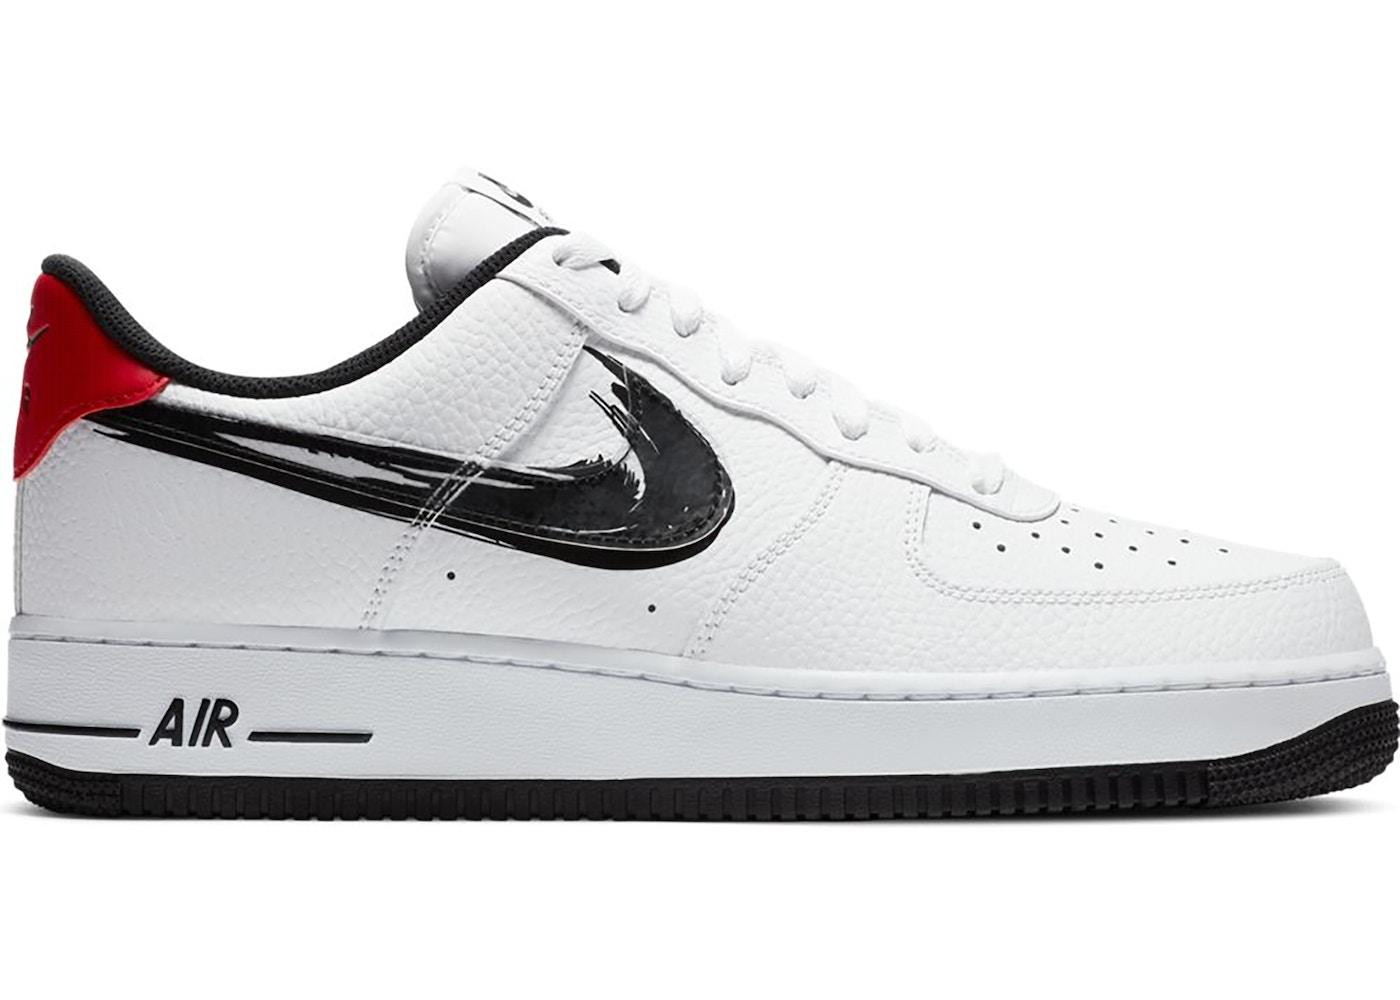 Nike Air Force 1 Low Brushstroke White Black